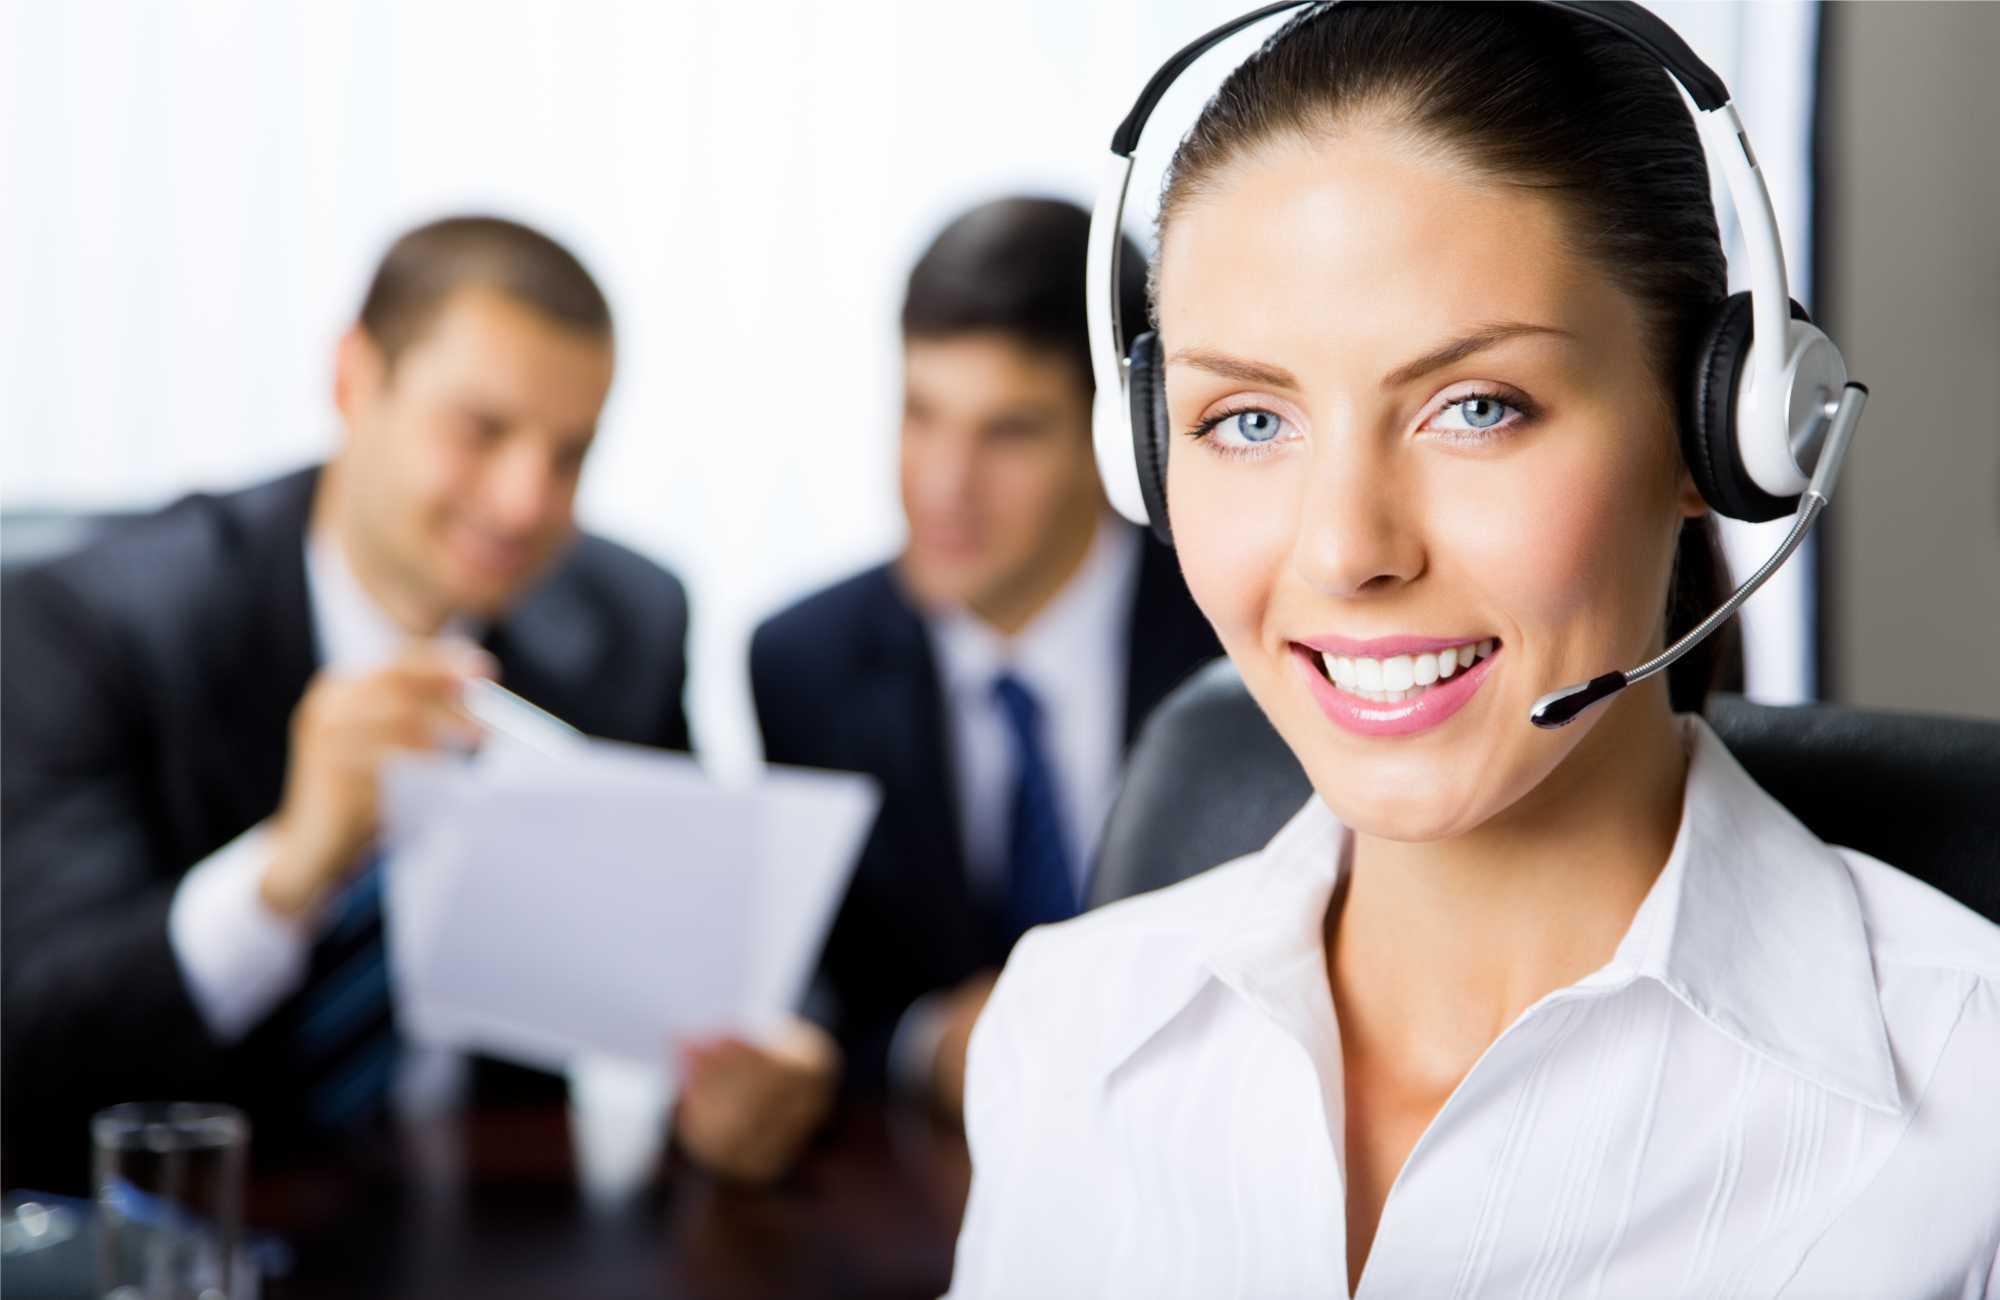 virtual-receptionist-australia-hero-160518.jpg